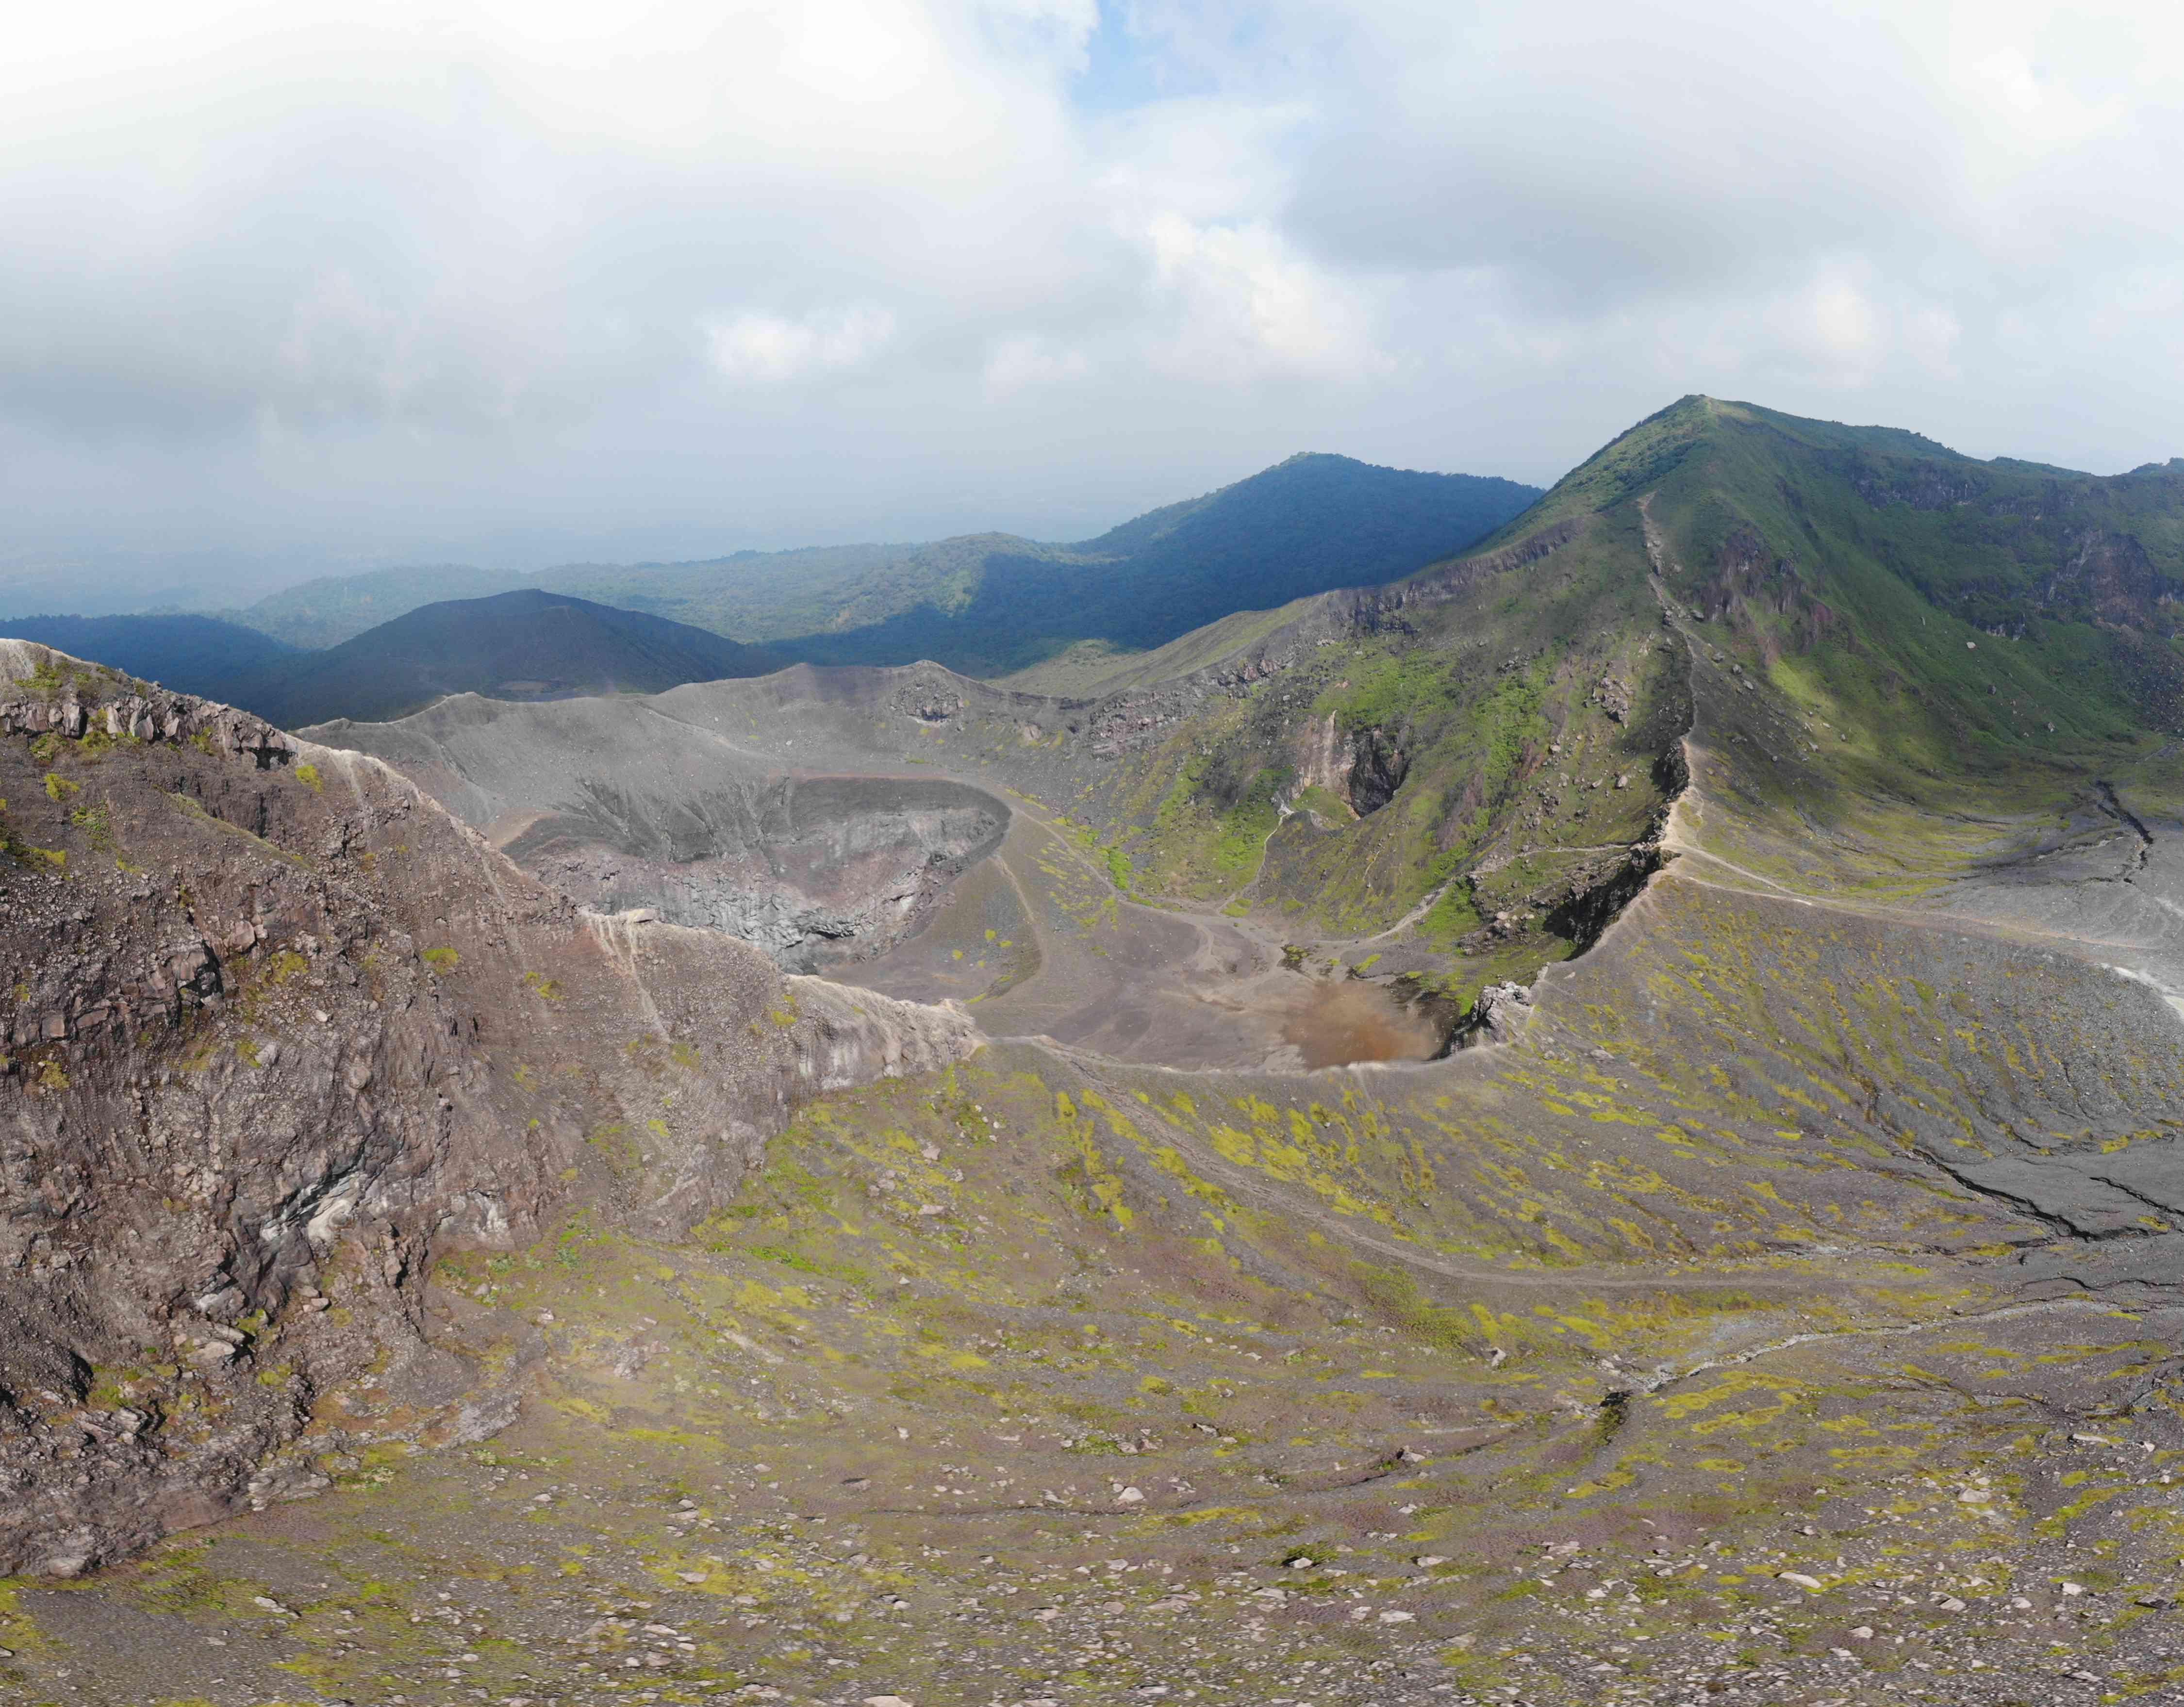 Mount Kaba volcano hike near Bengkulu, Sumatra